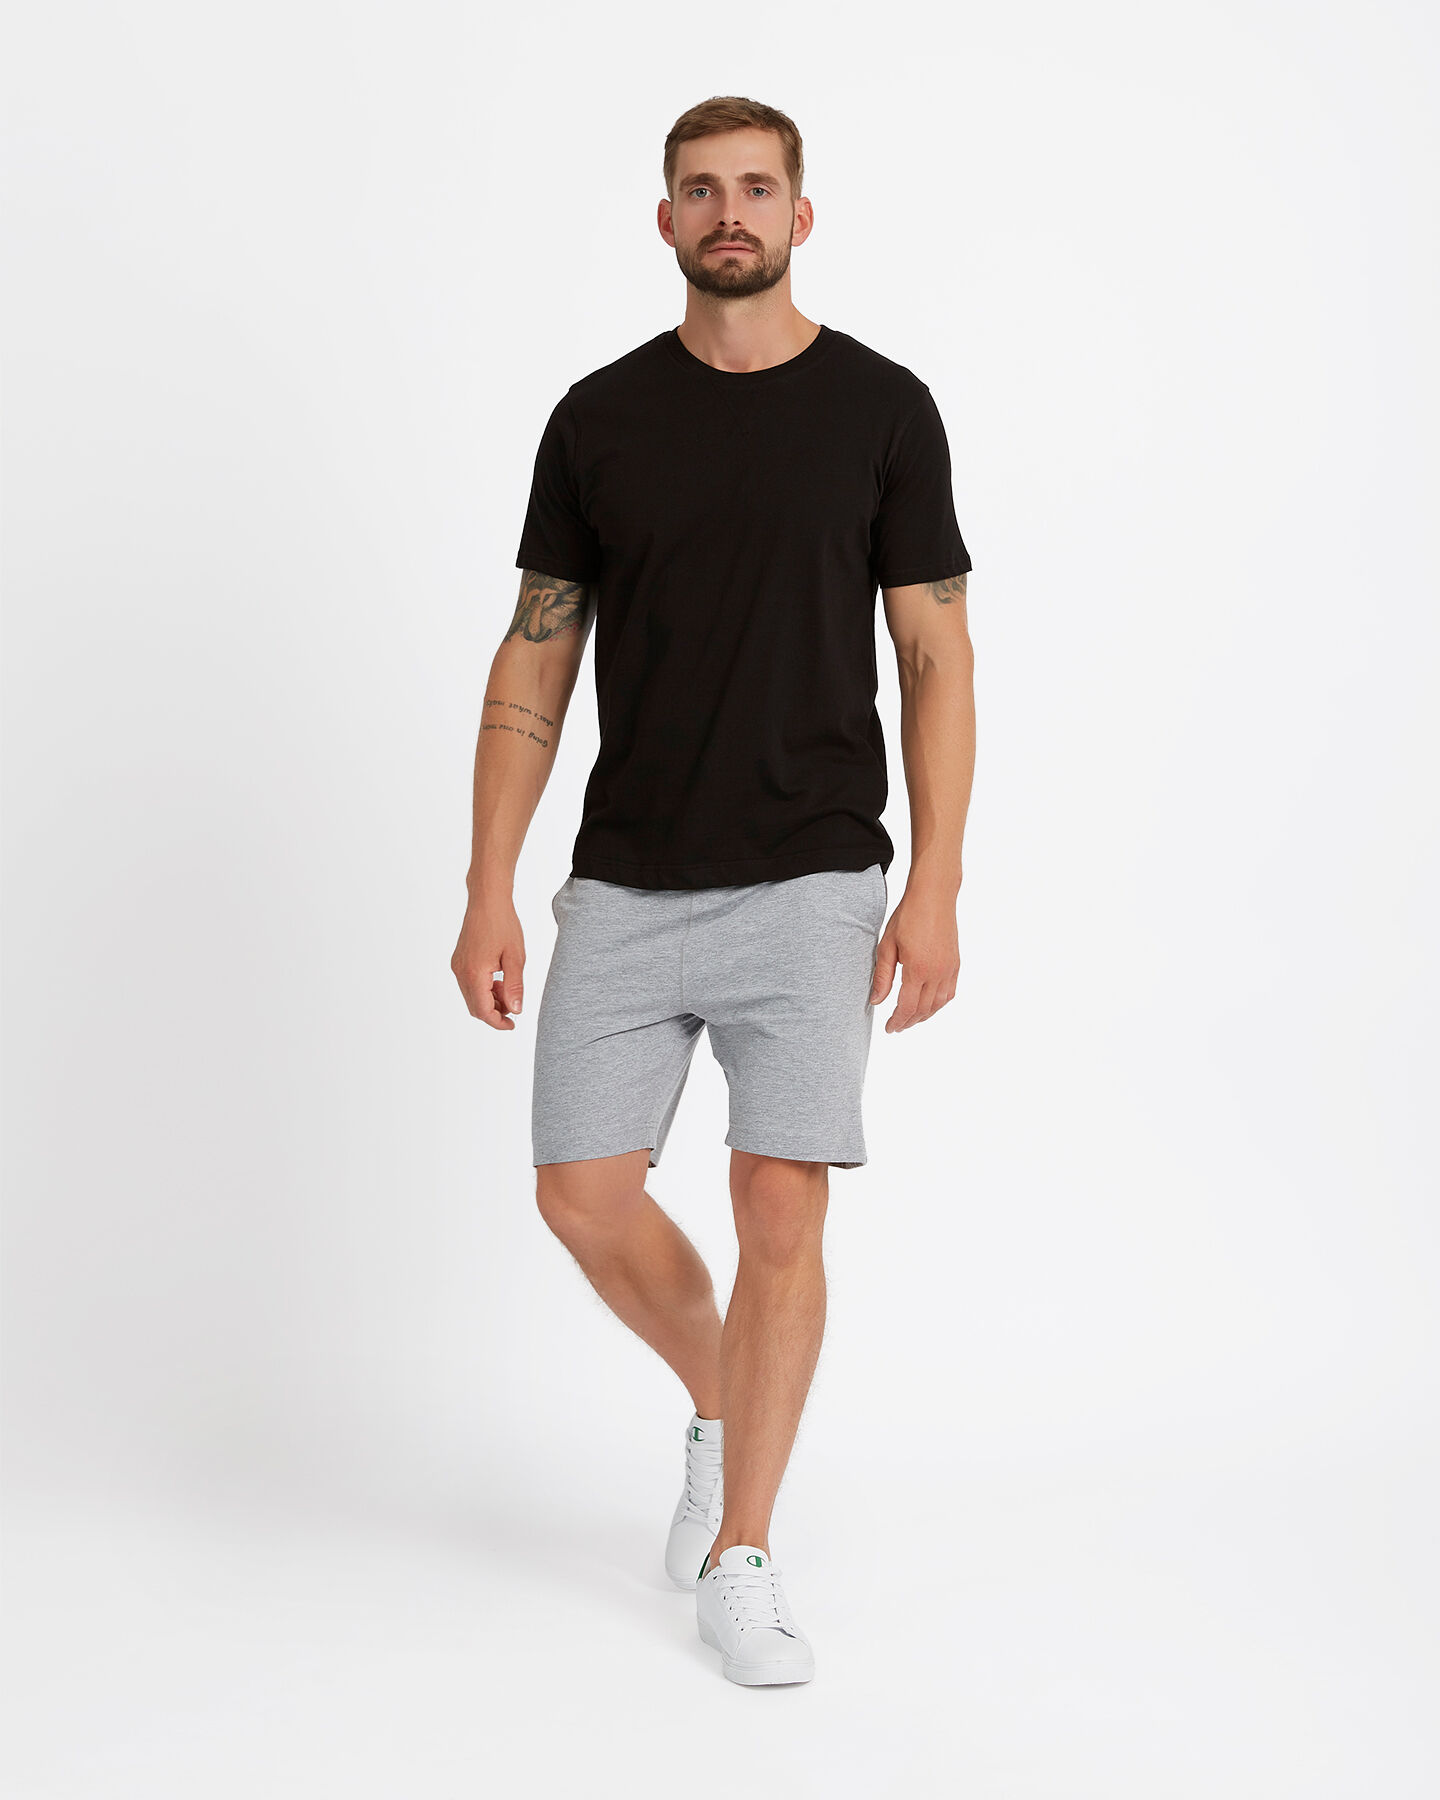 T-Shirt ABC GIROCOLLO M S1298307 scatto 1